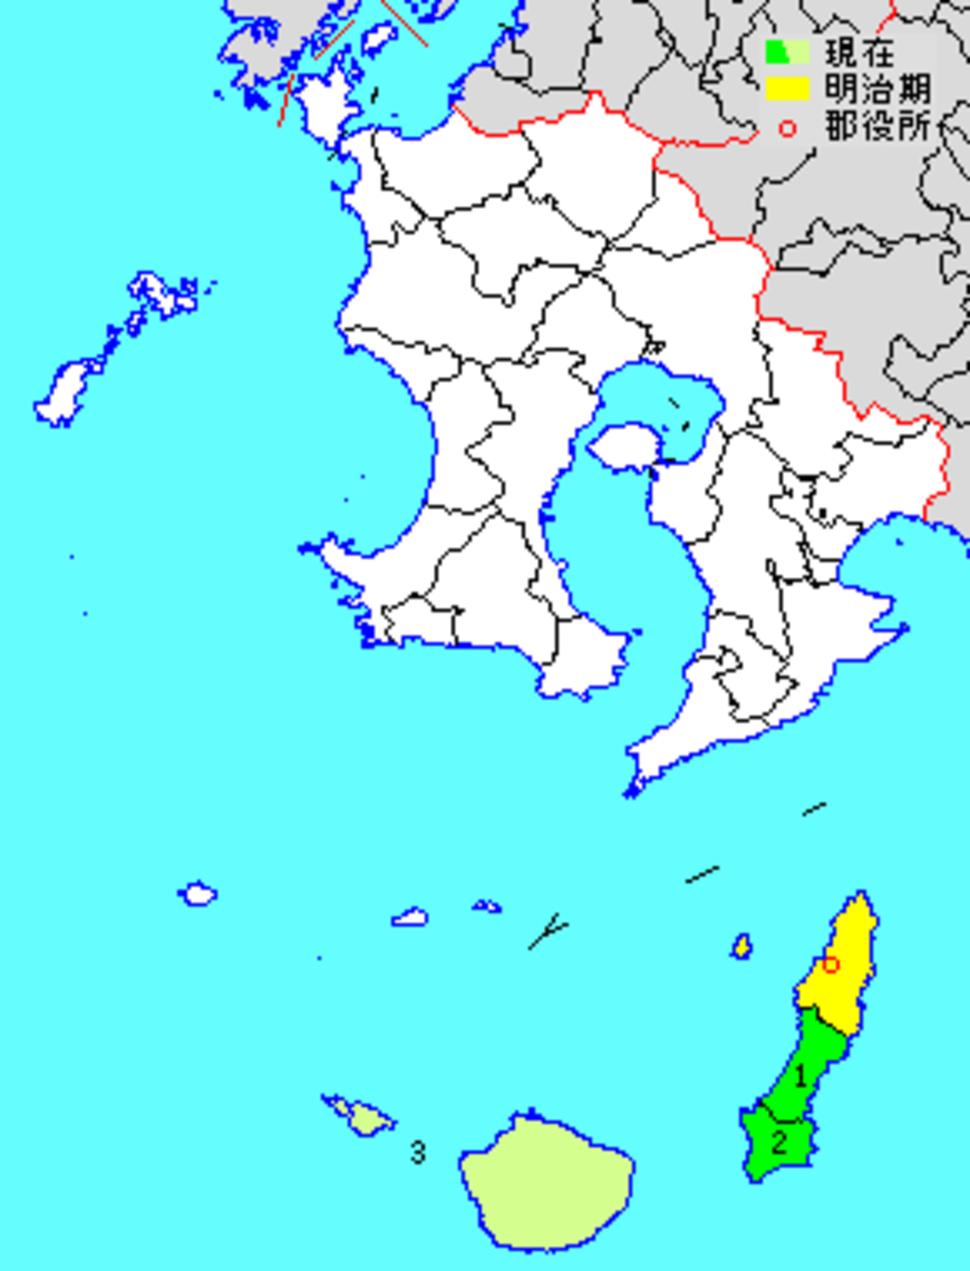 Kumage District in Kagoshima Prefecture